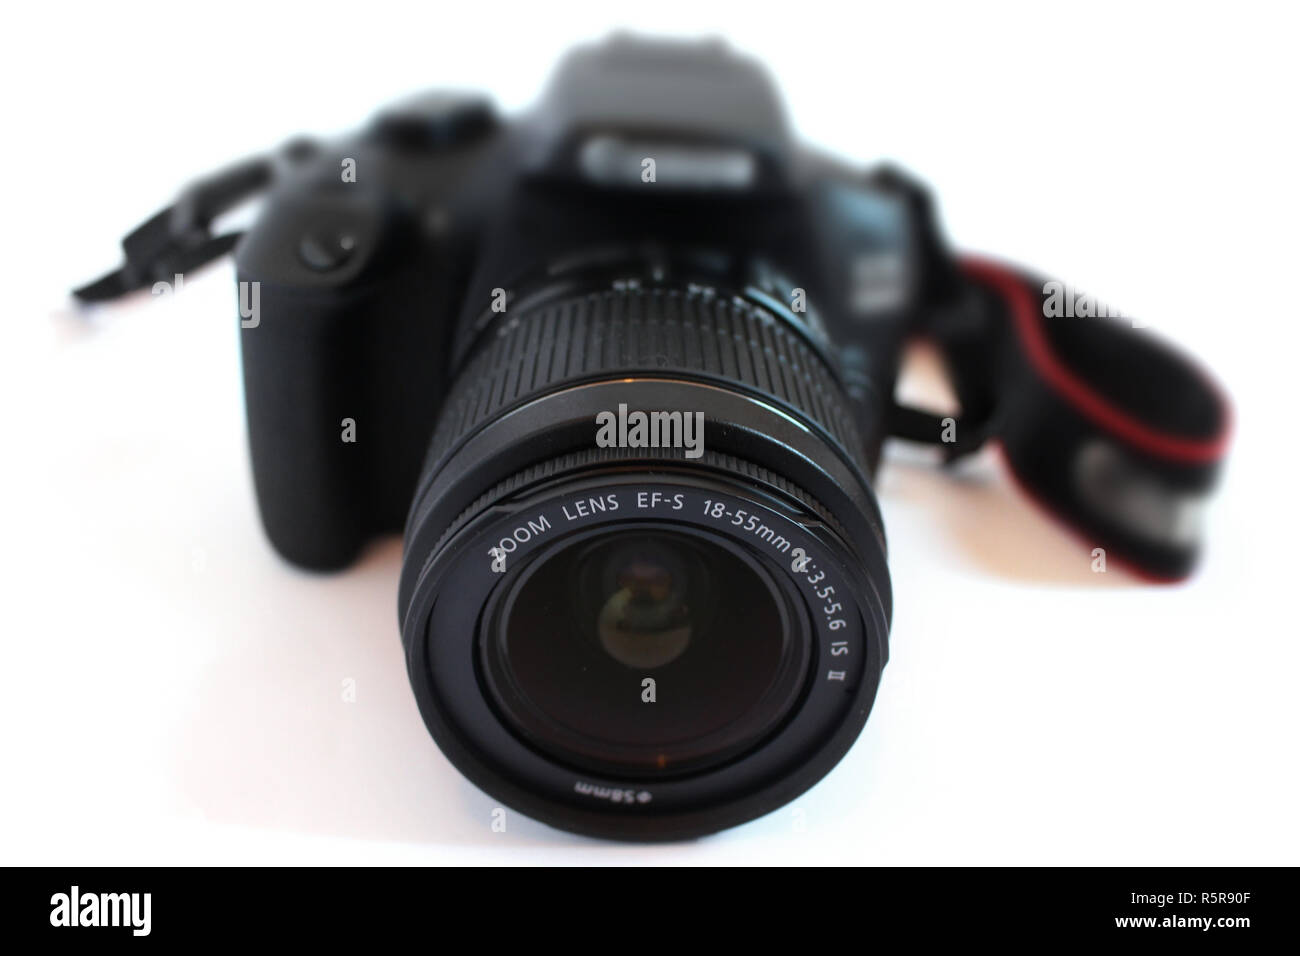 Camera black digital slr single lens reflex - Stock Image